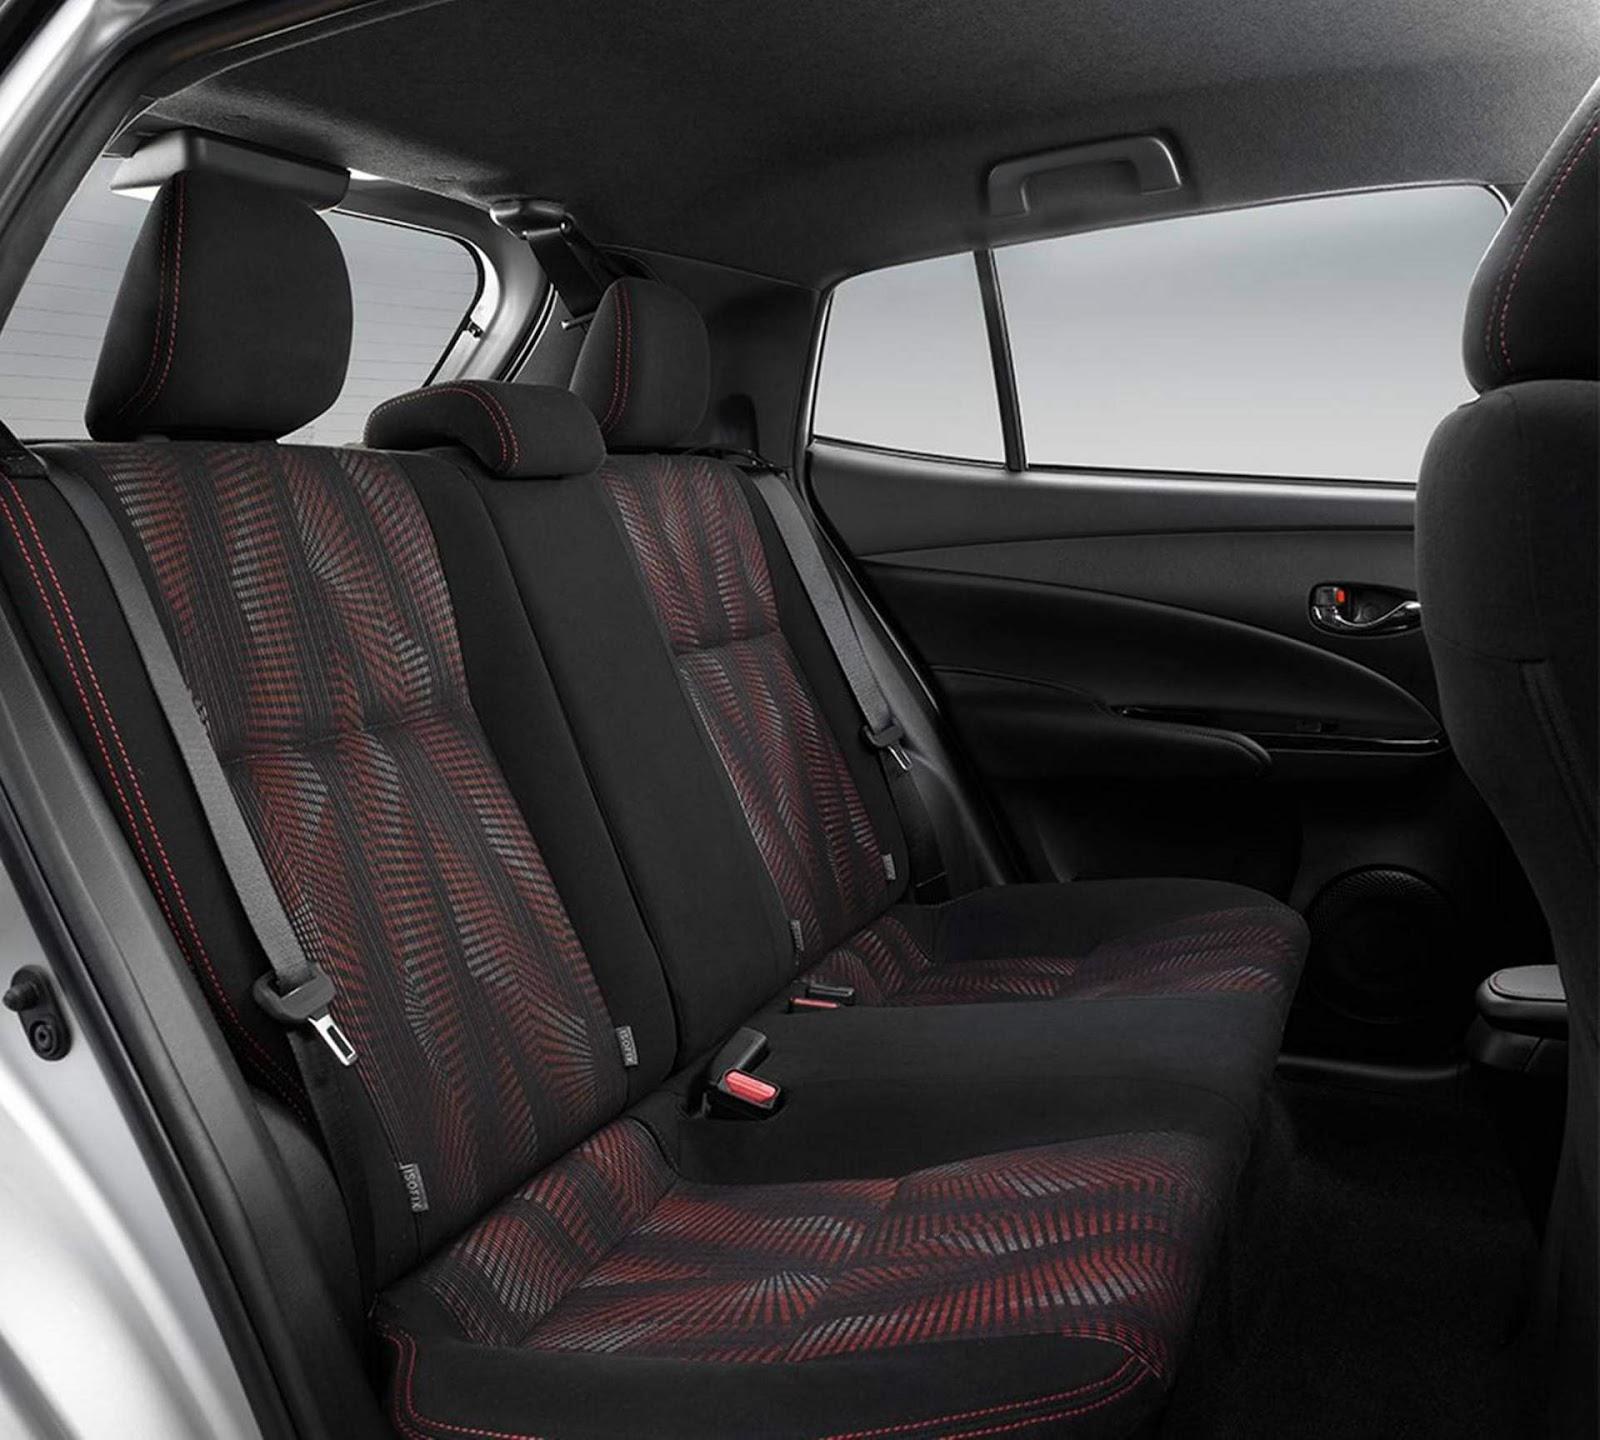 toyota yaris hatch 2018 chega ao m xico por r car blog br. Black Bedroom Furniture Sets. Home Design Ideas